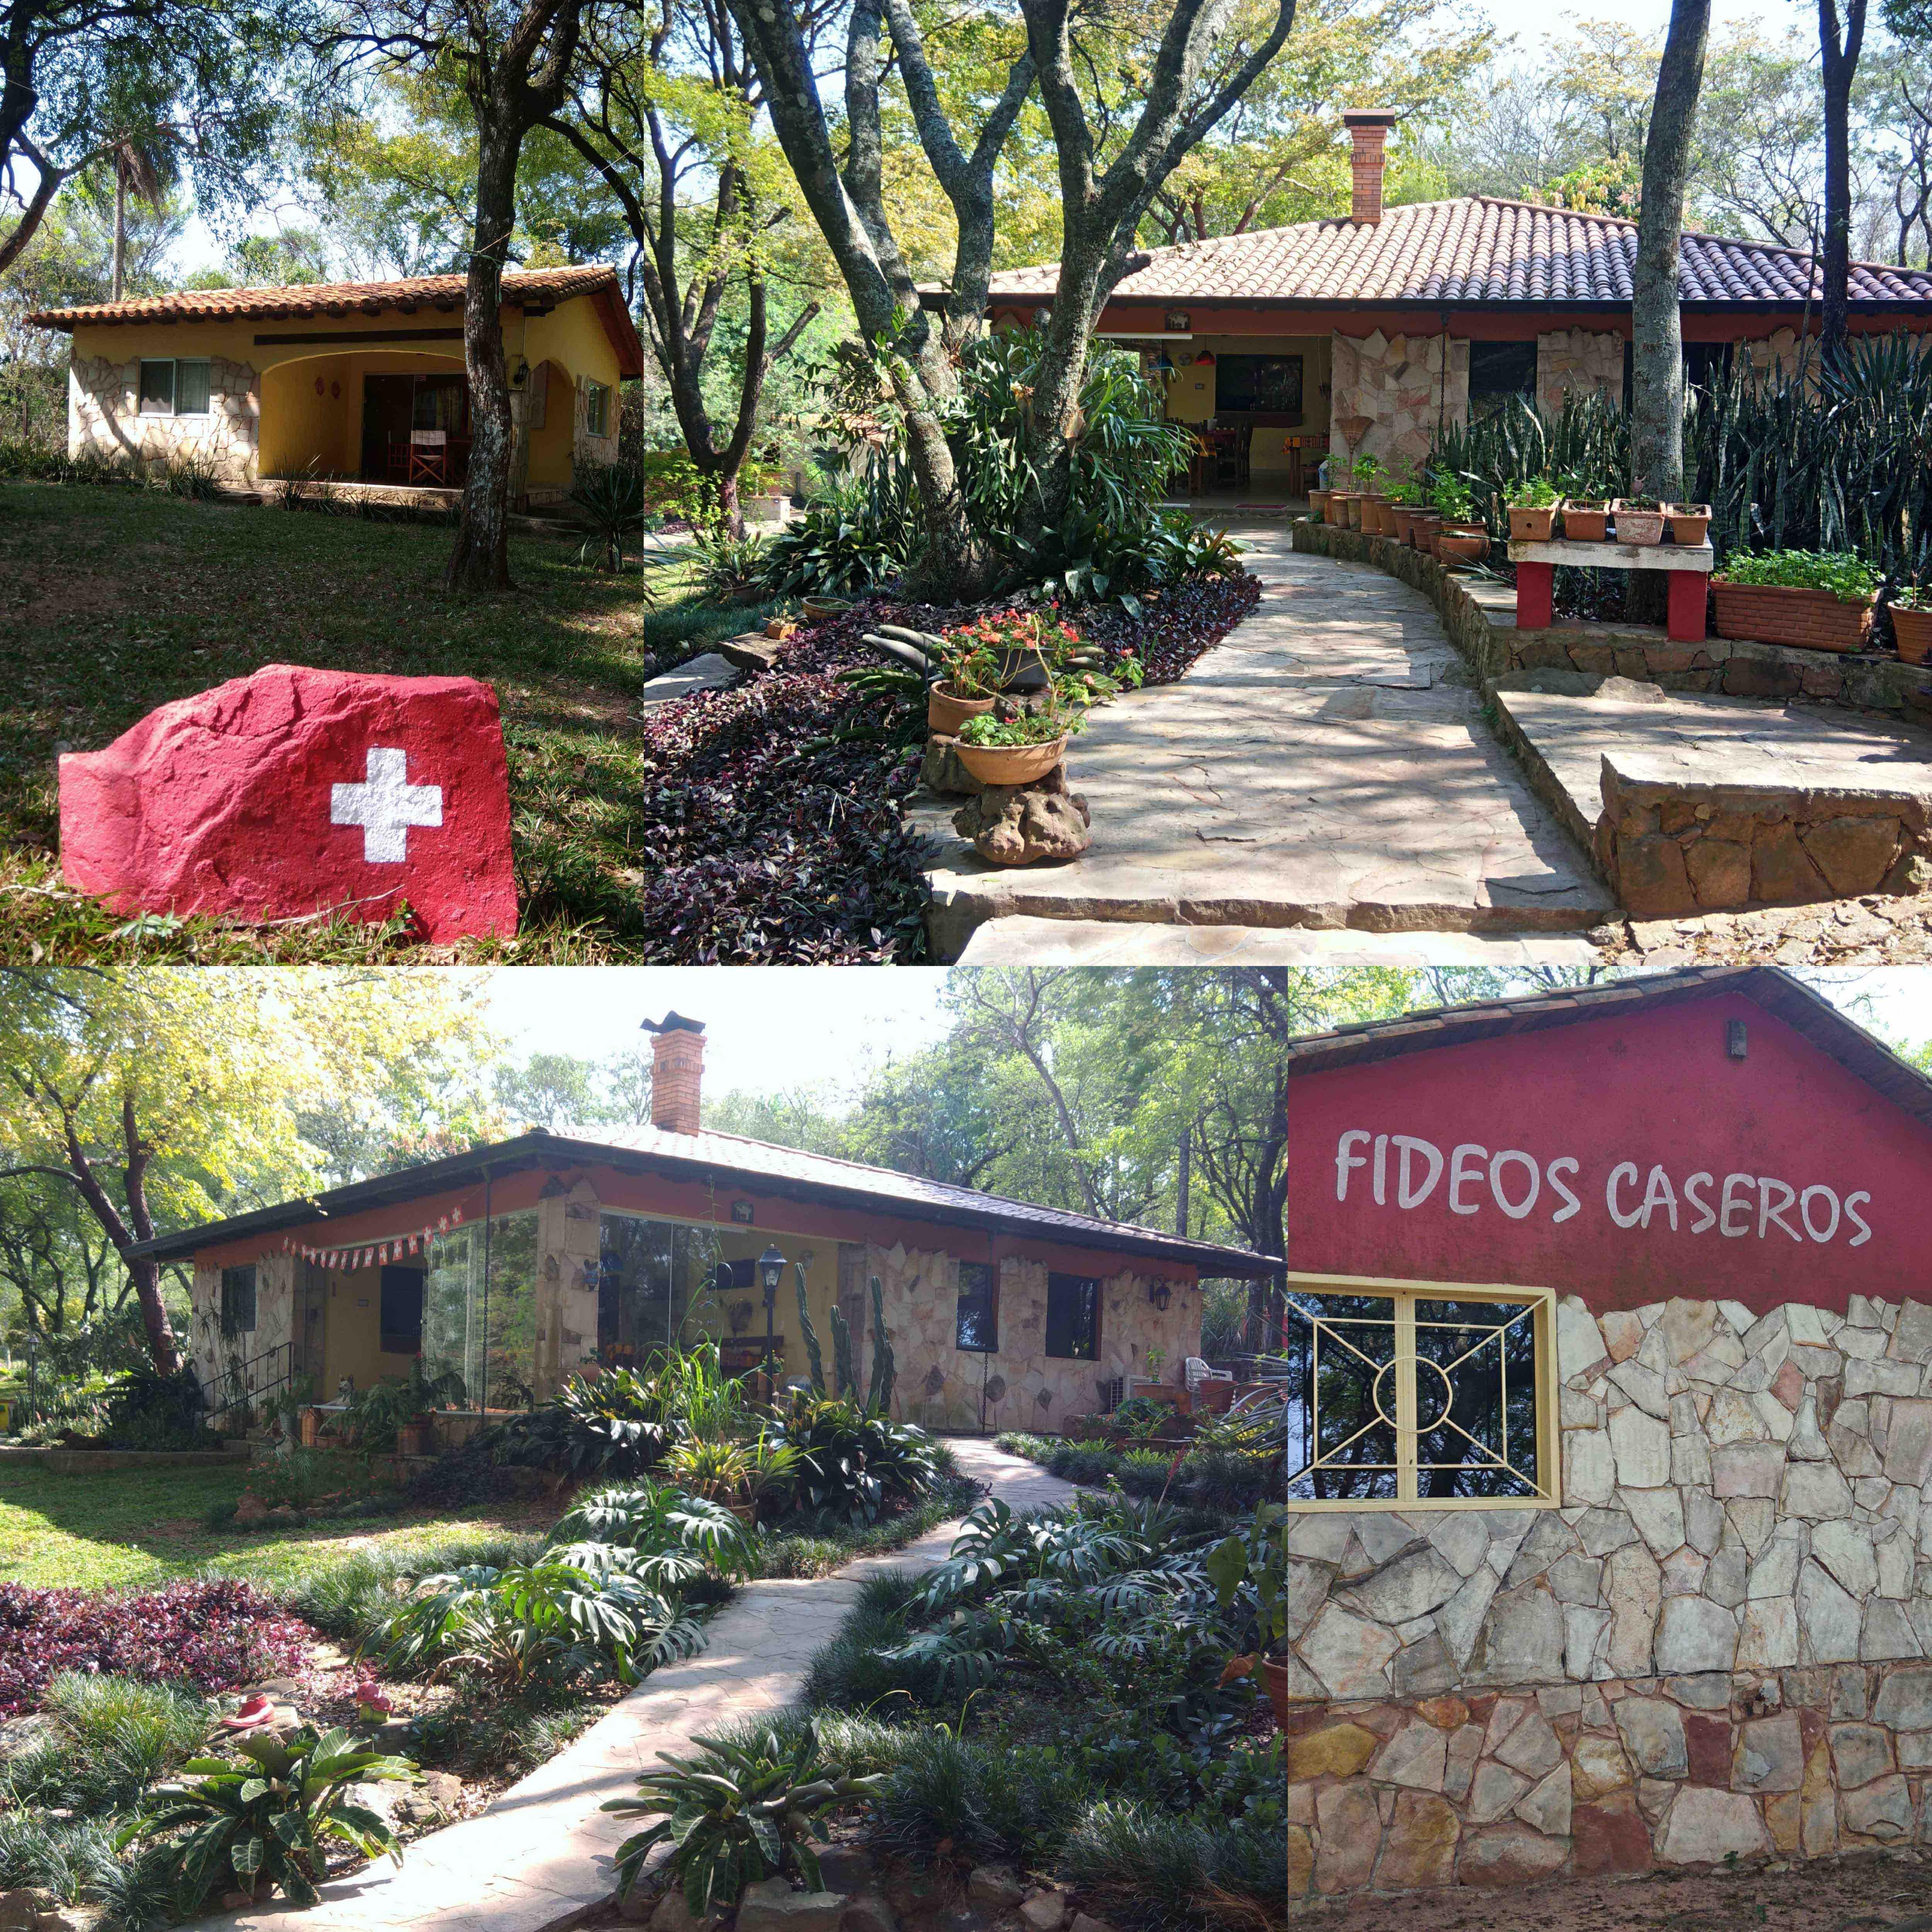 006 2208 - 10092017 Camping Hasta la Pasta 8jpeg